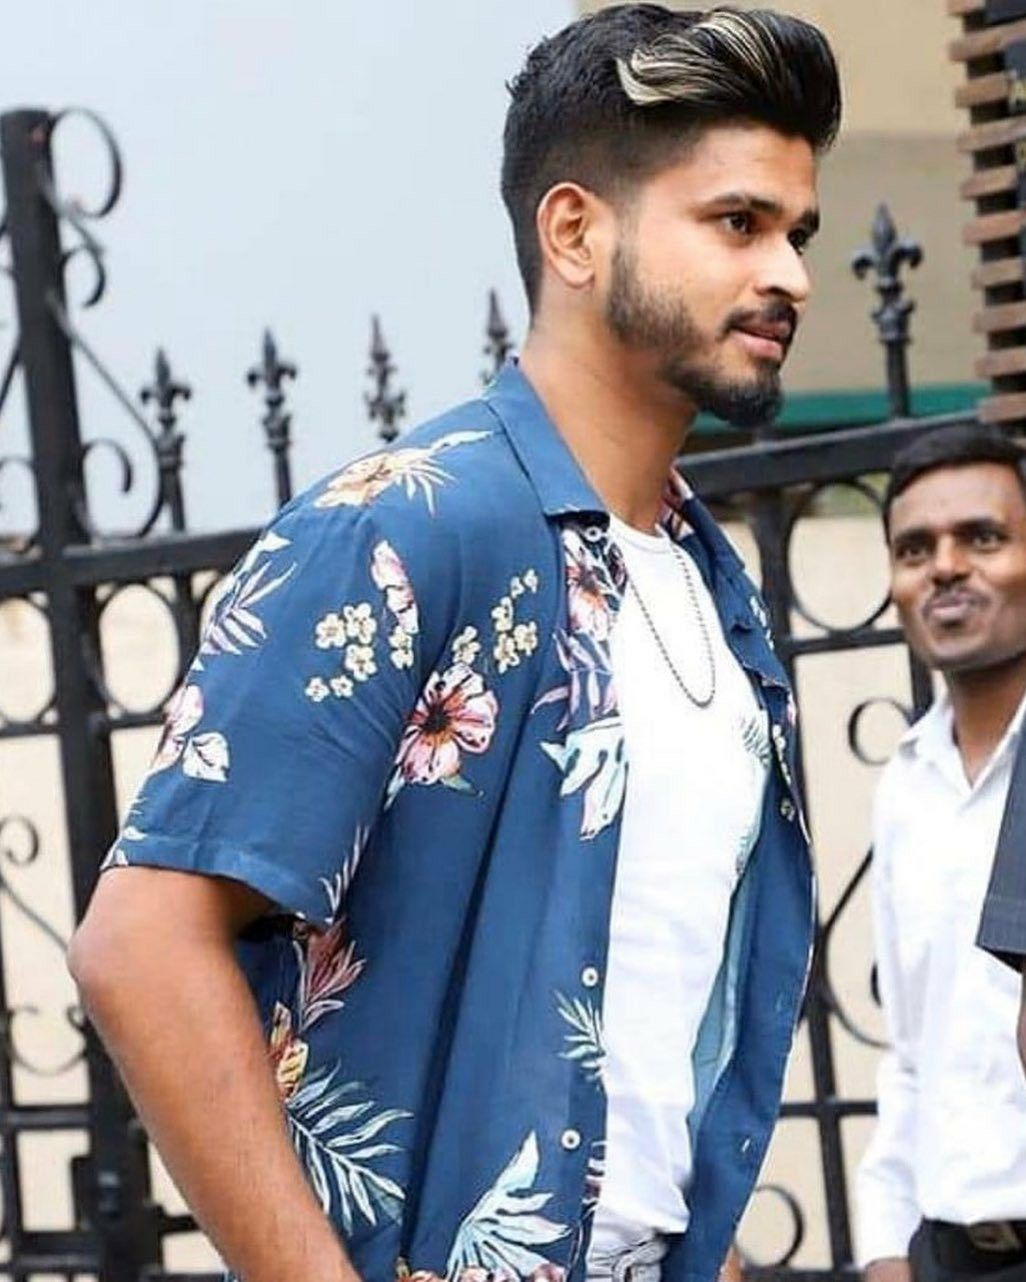 Shreyas Iyer ÇÅ🏏 Ms dhoni photos, Cricket sport, Handsome